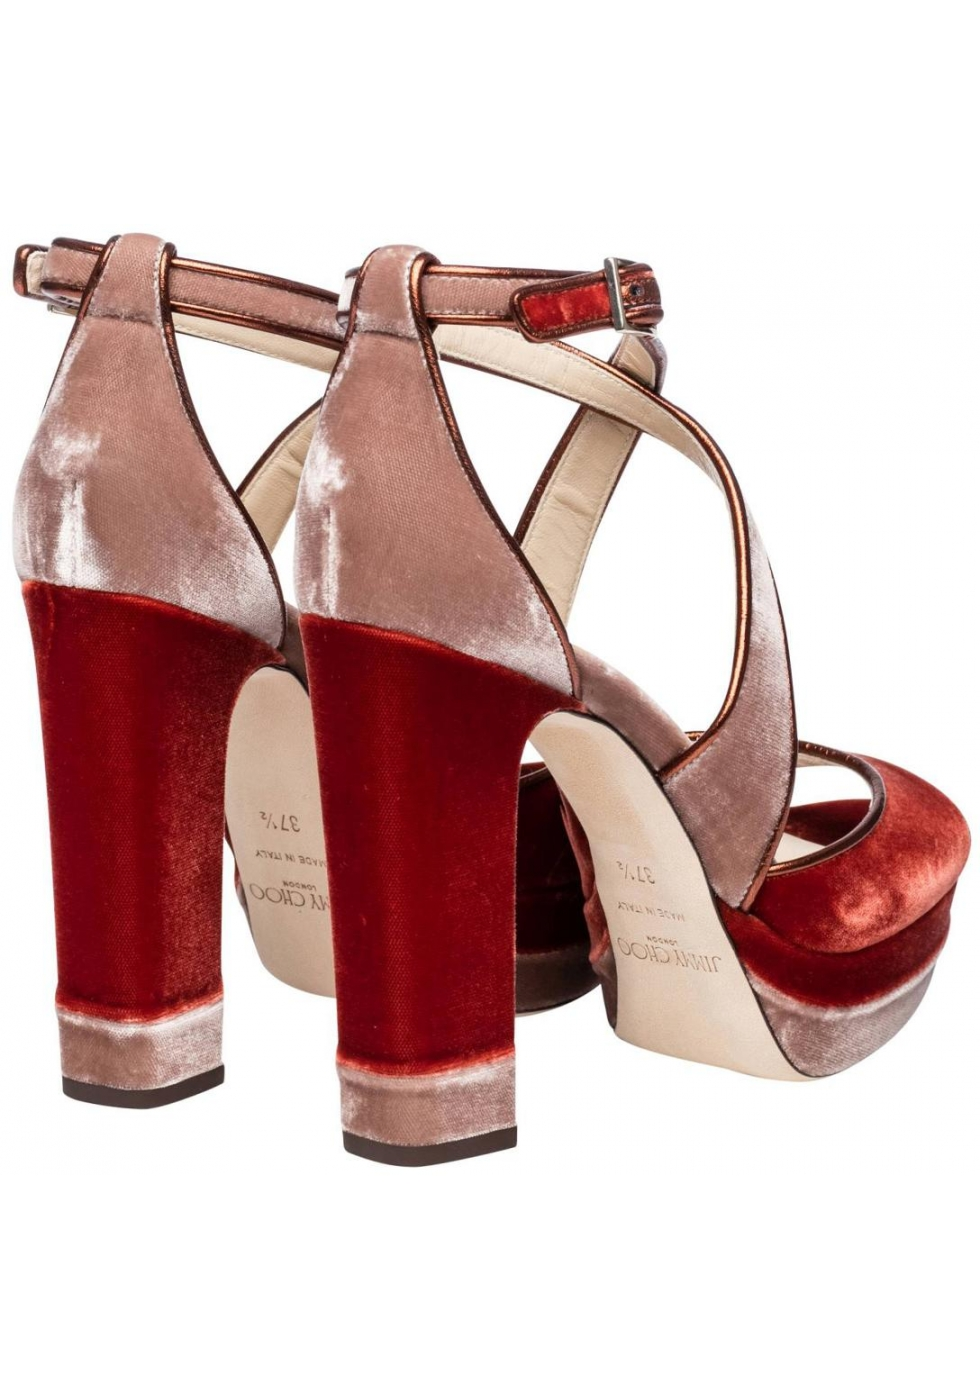 c7534674c10 Jimmy Choo heeled sandals with platform in orange Velvet - Italian ...